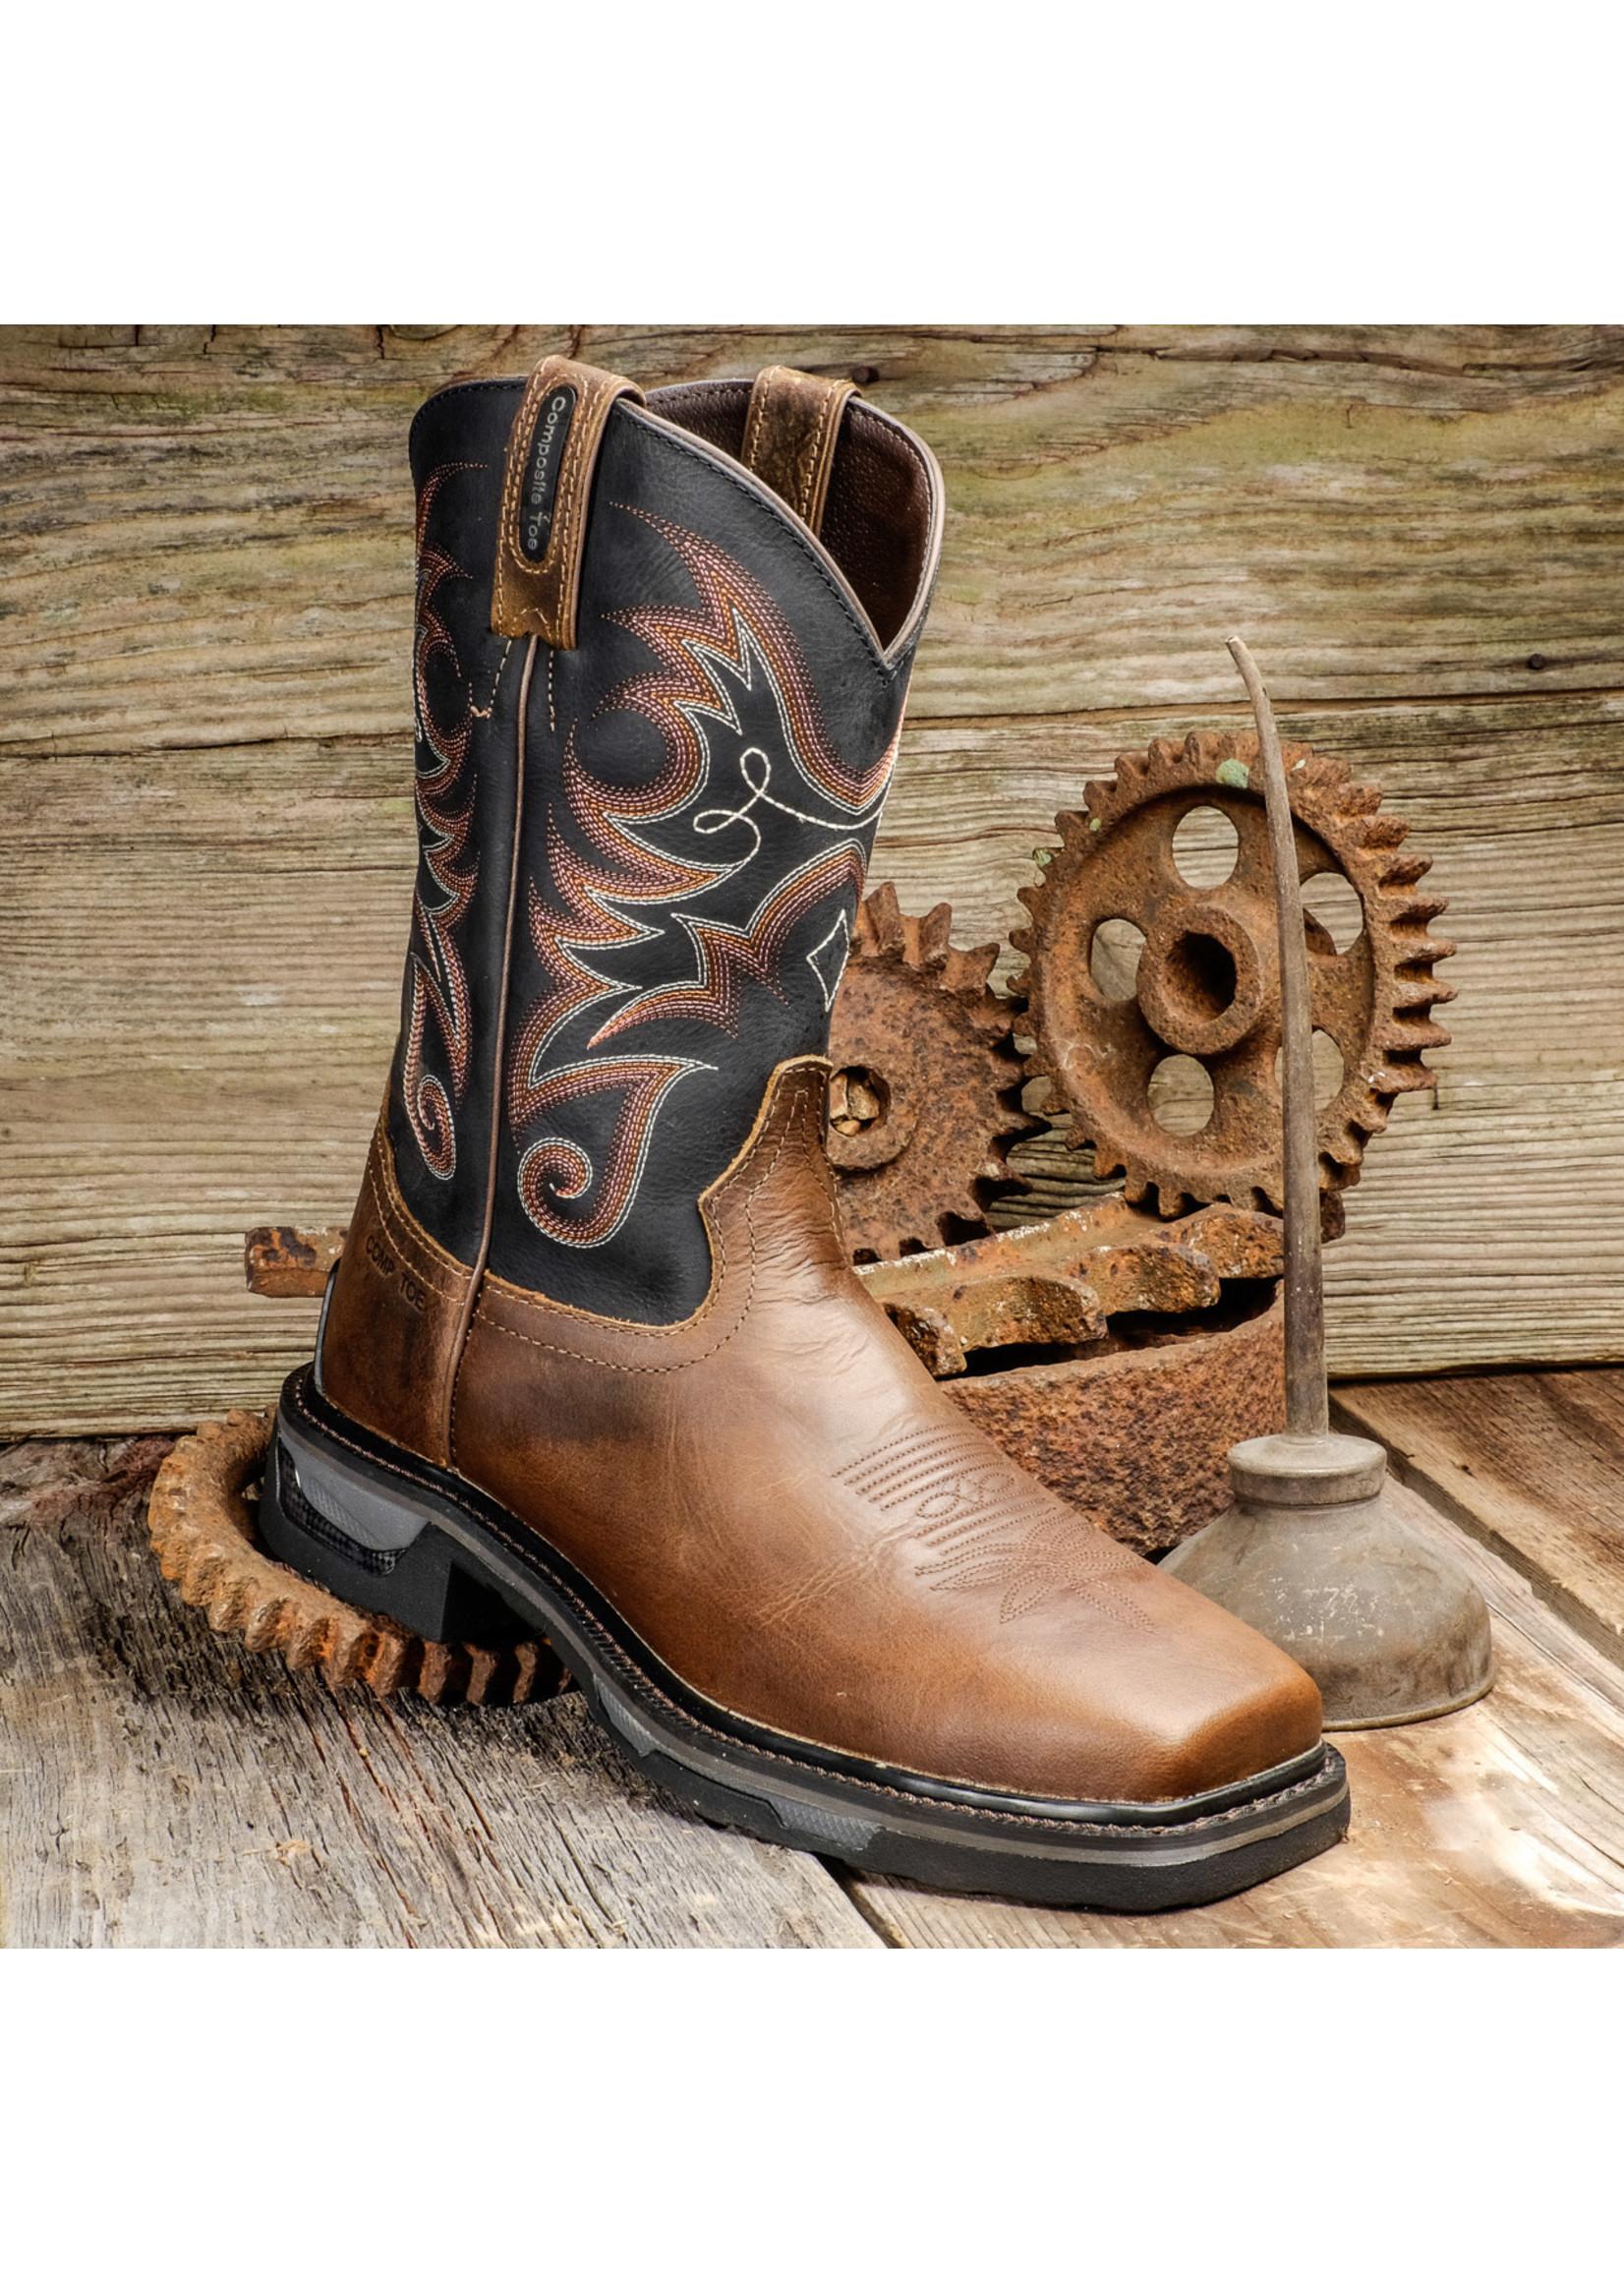 Tony Lama Men's Diboll Composite Toe TLX Work Boots TW4004